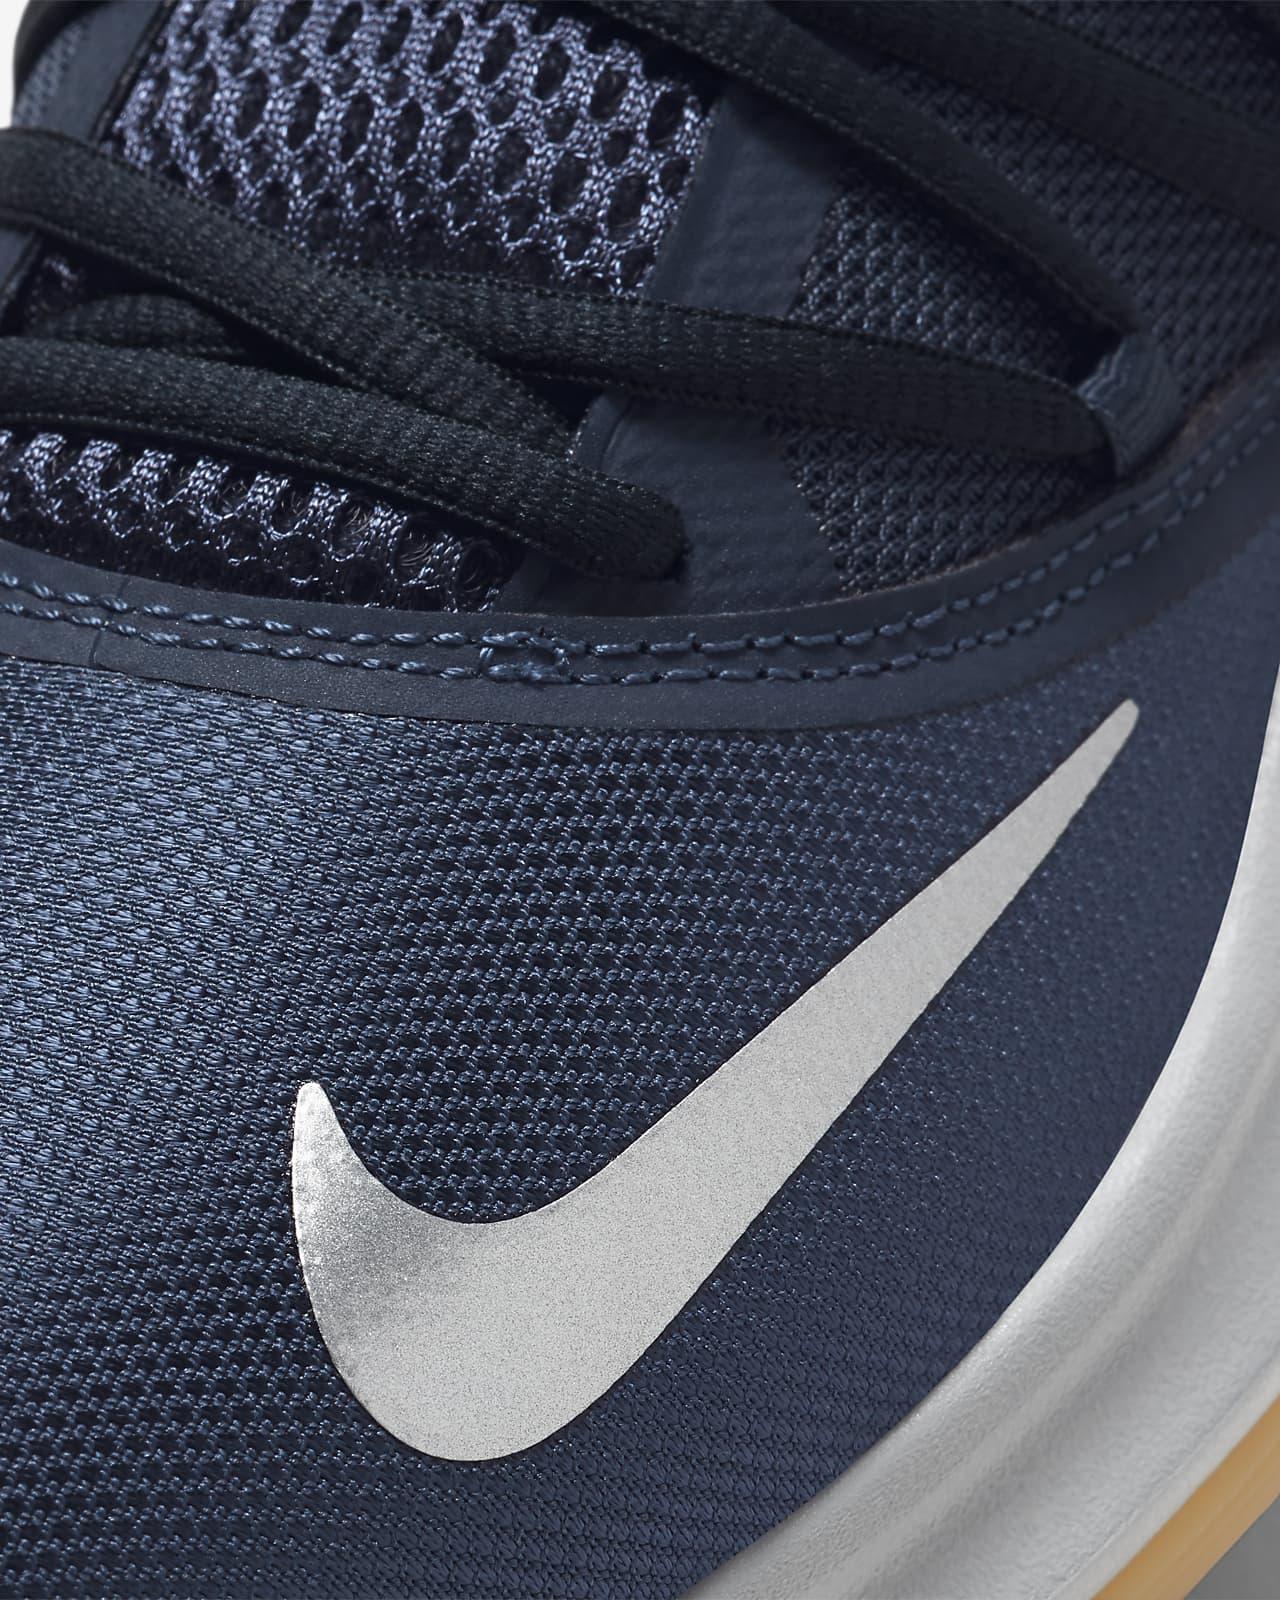 nike women's air versitile ii basketball shoes